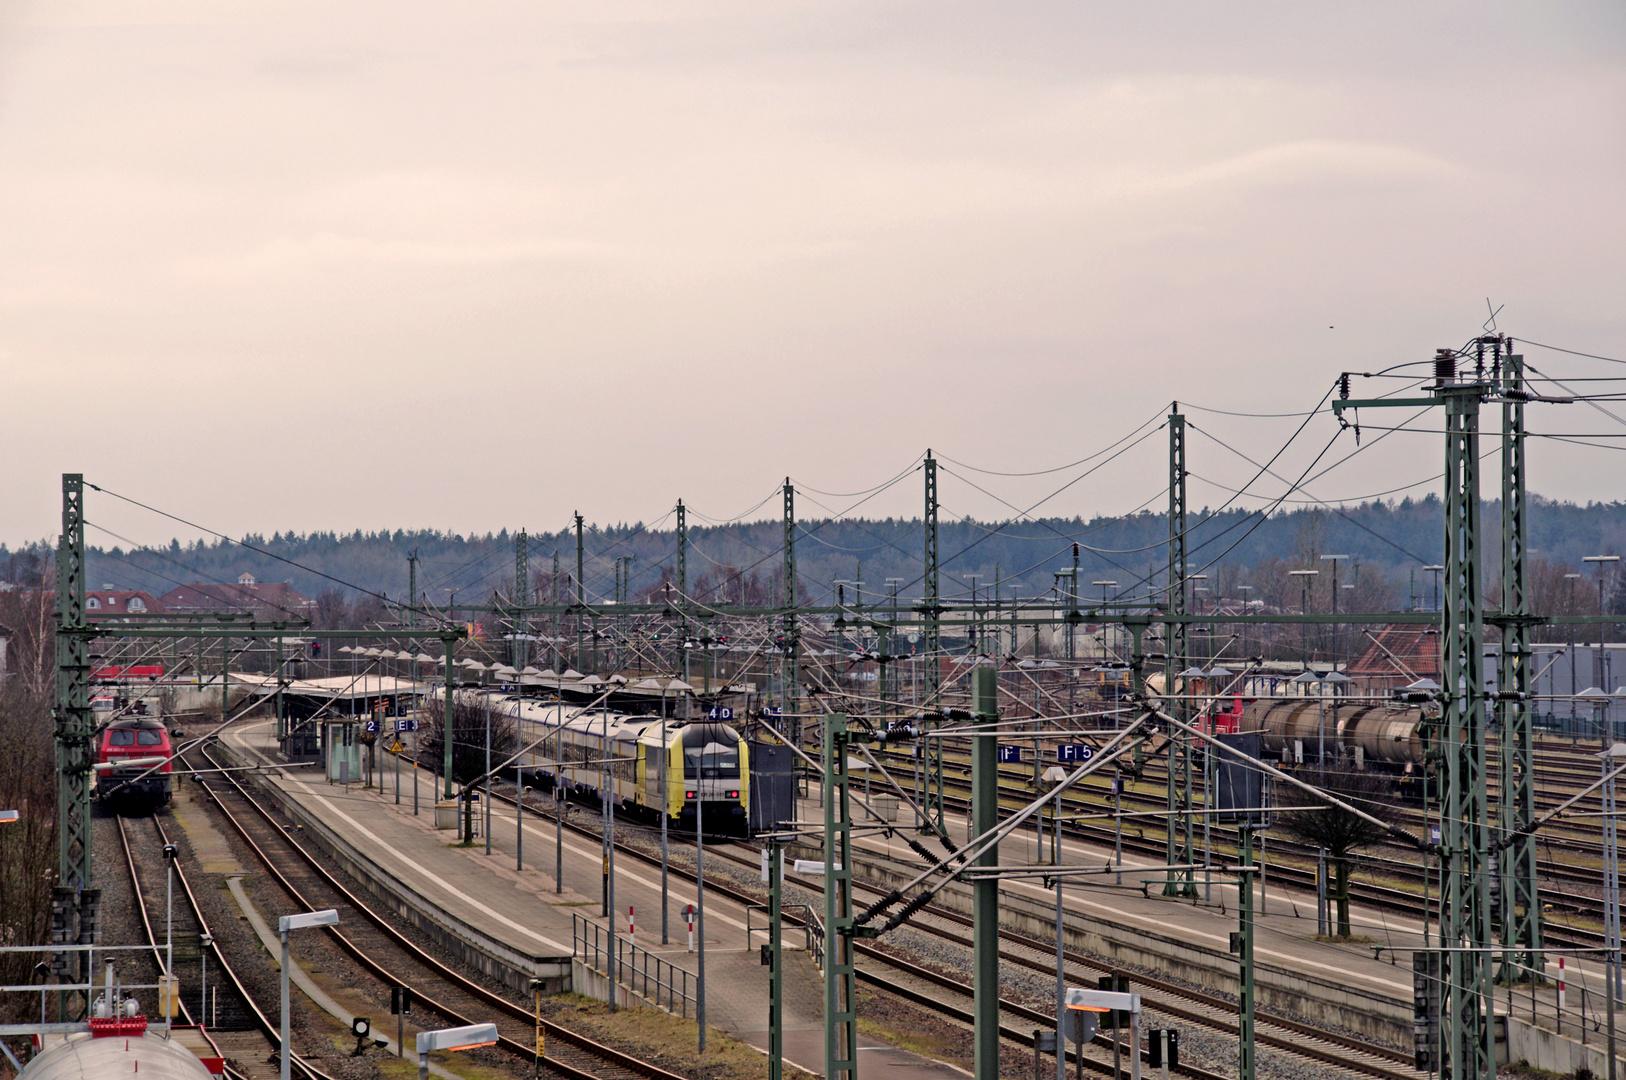 Itzehoe Bahnhof